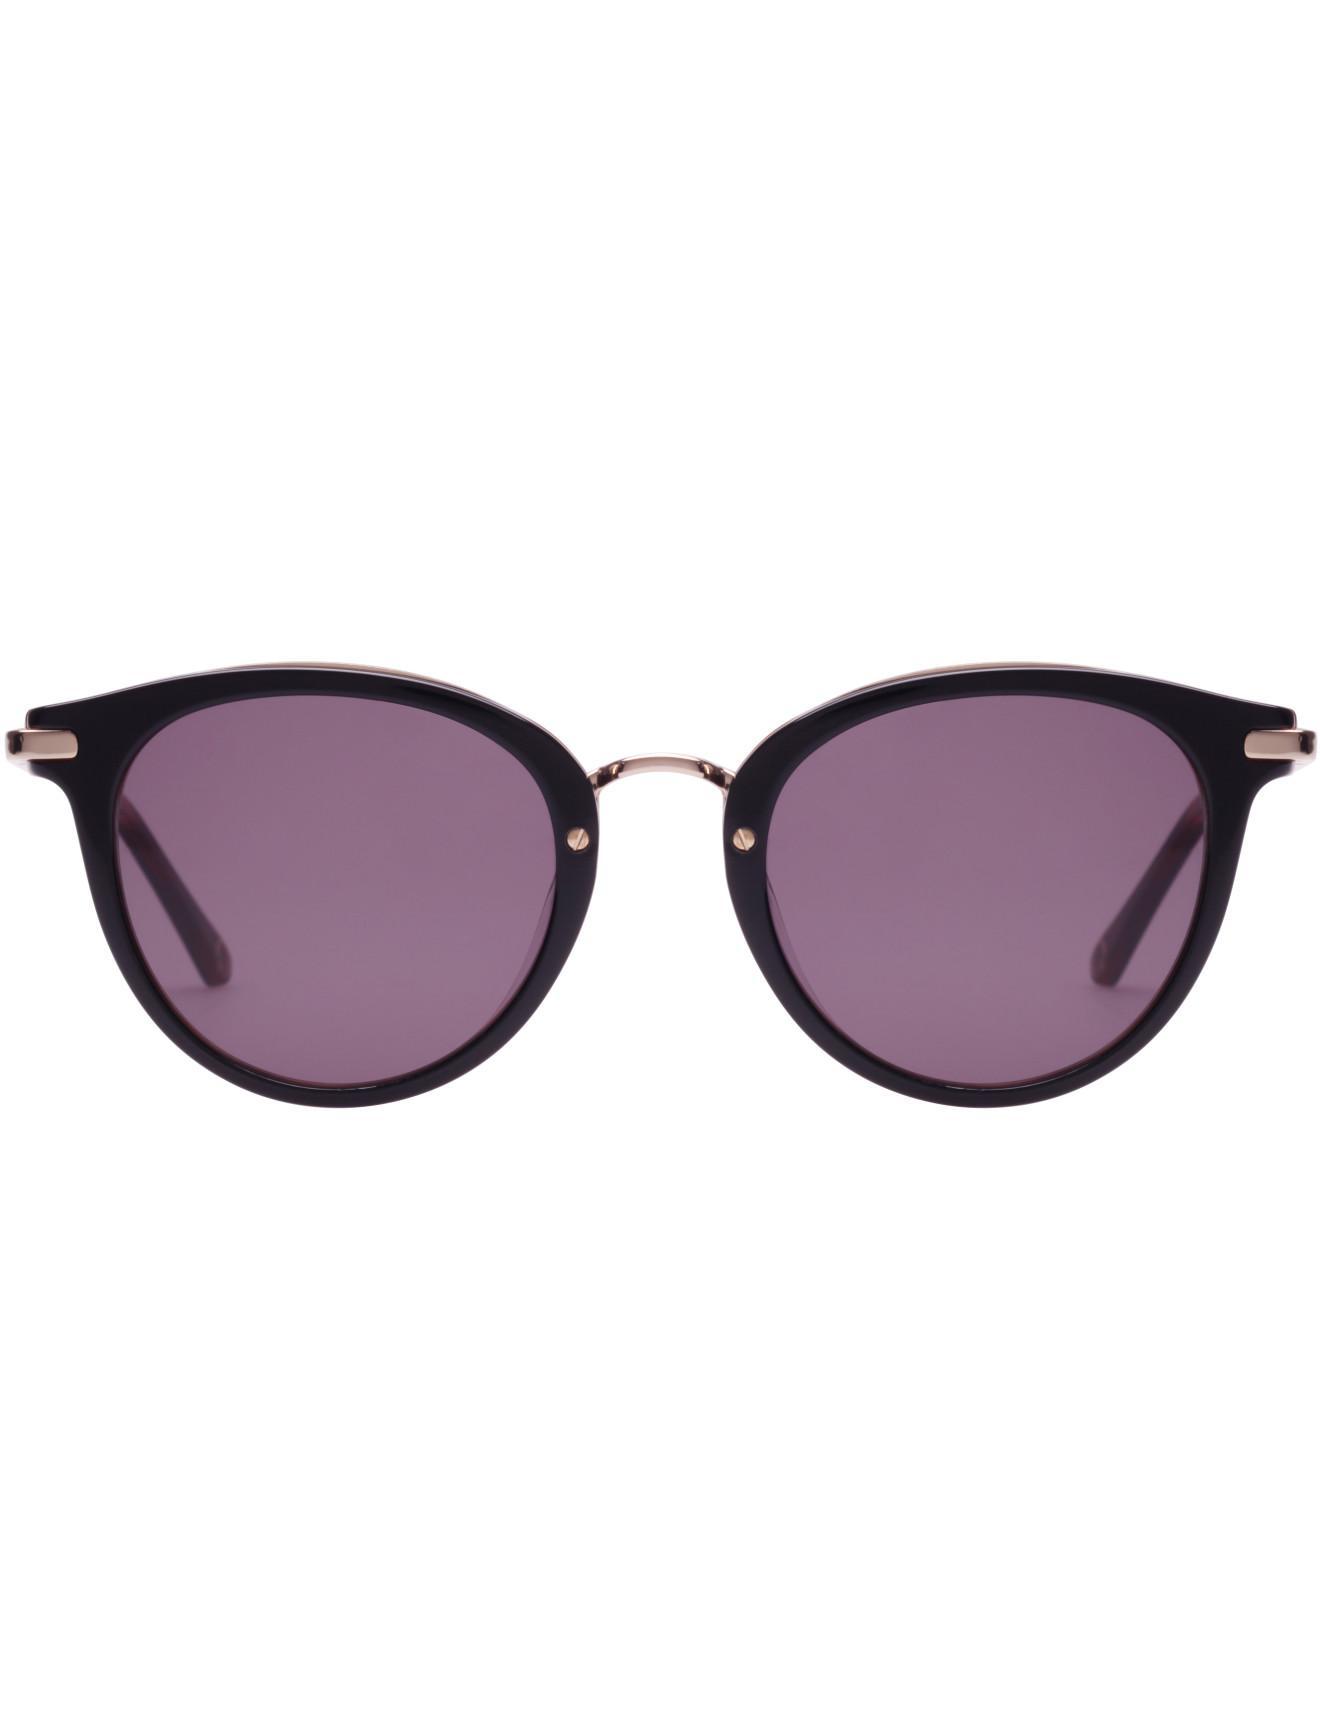 8f2c57cdea2 Gallery. Previously sold at  David Jones · Men s Rectangular Sunglasses  Women s ...